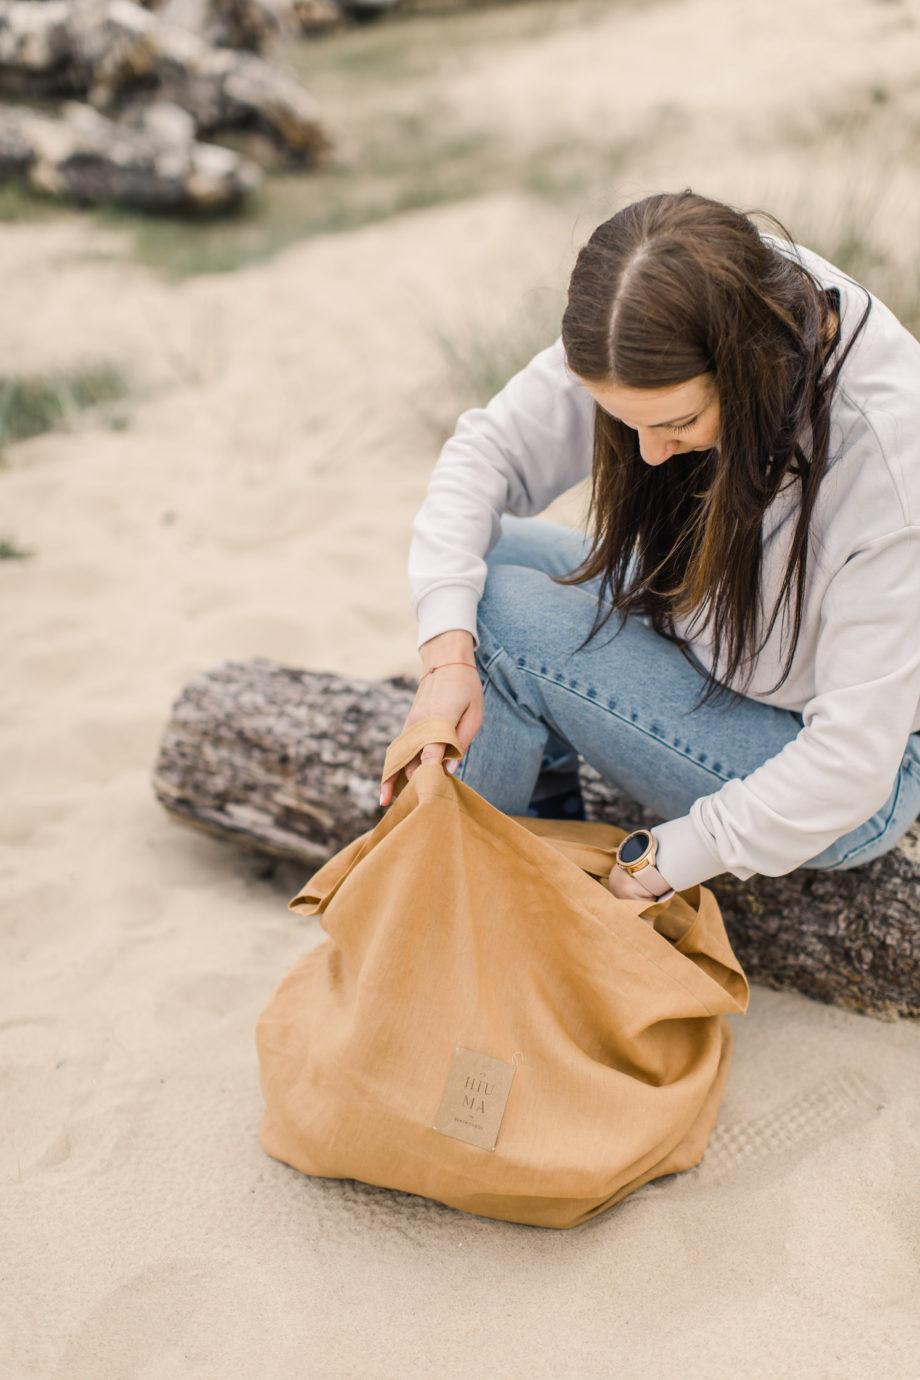 torba lniana hiumastore, lniana torba na plażę